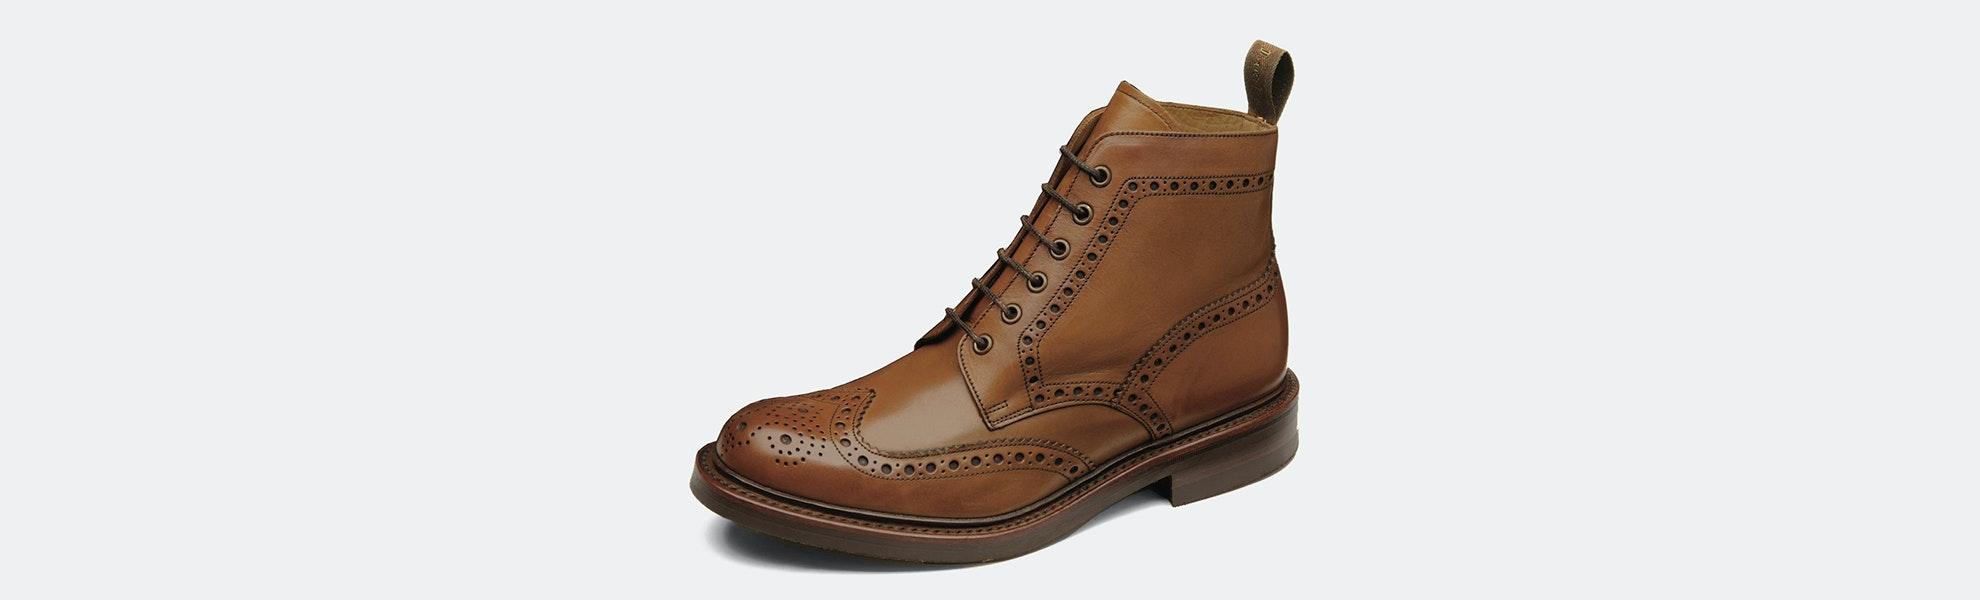 Loake 1880 Bedale Wingtip Boot